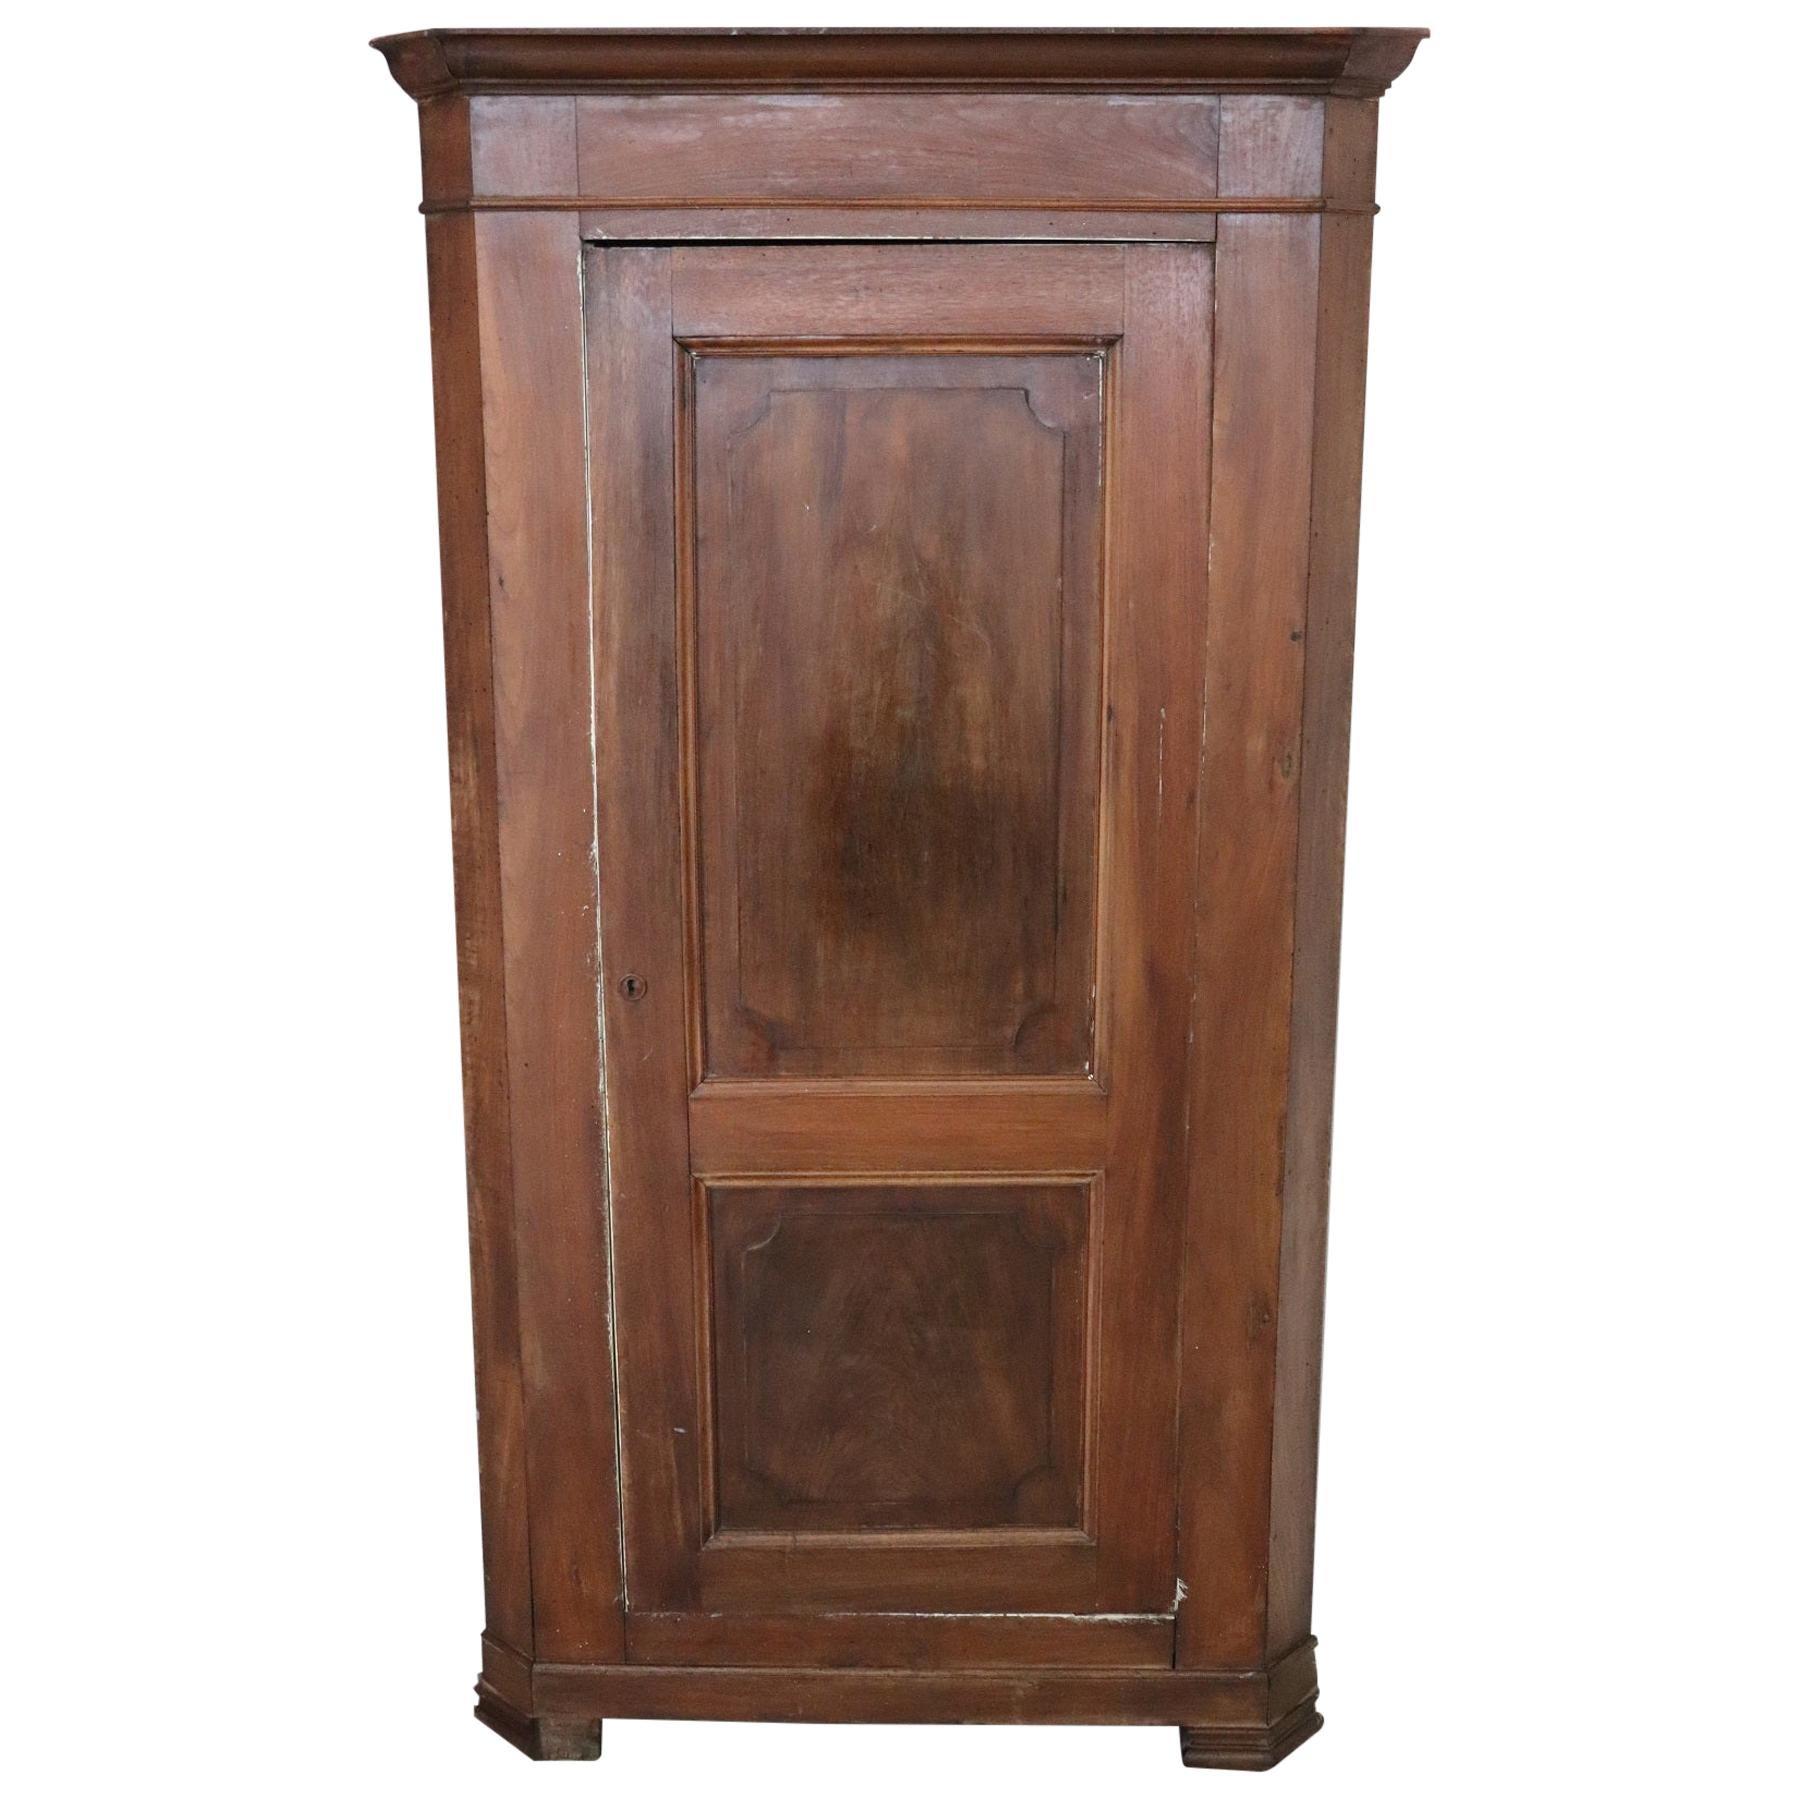 19th Century Italian Corner Cupboard or Corner Cabinet in Solid Walnut